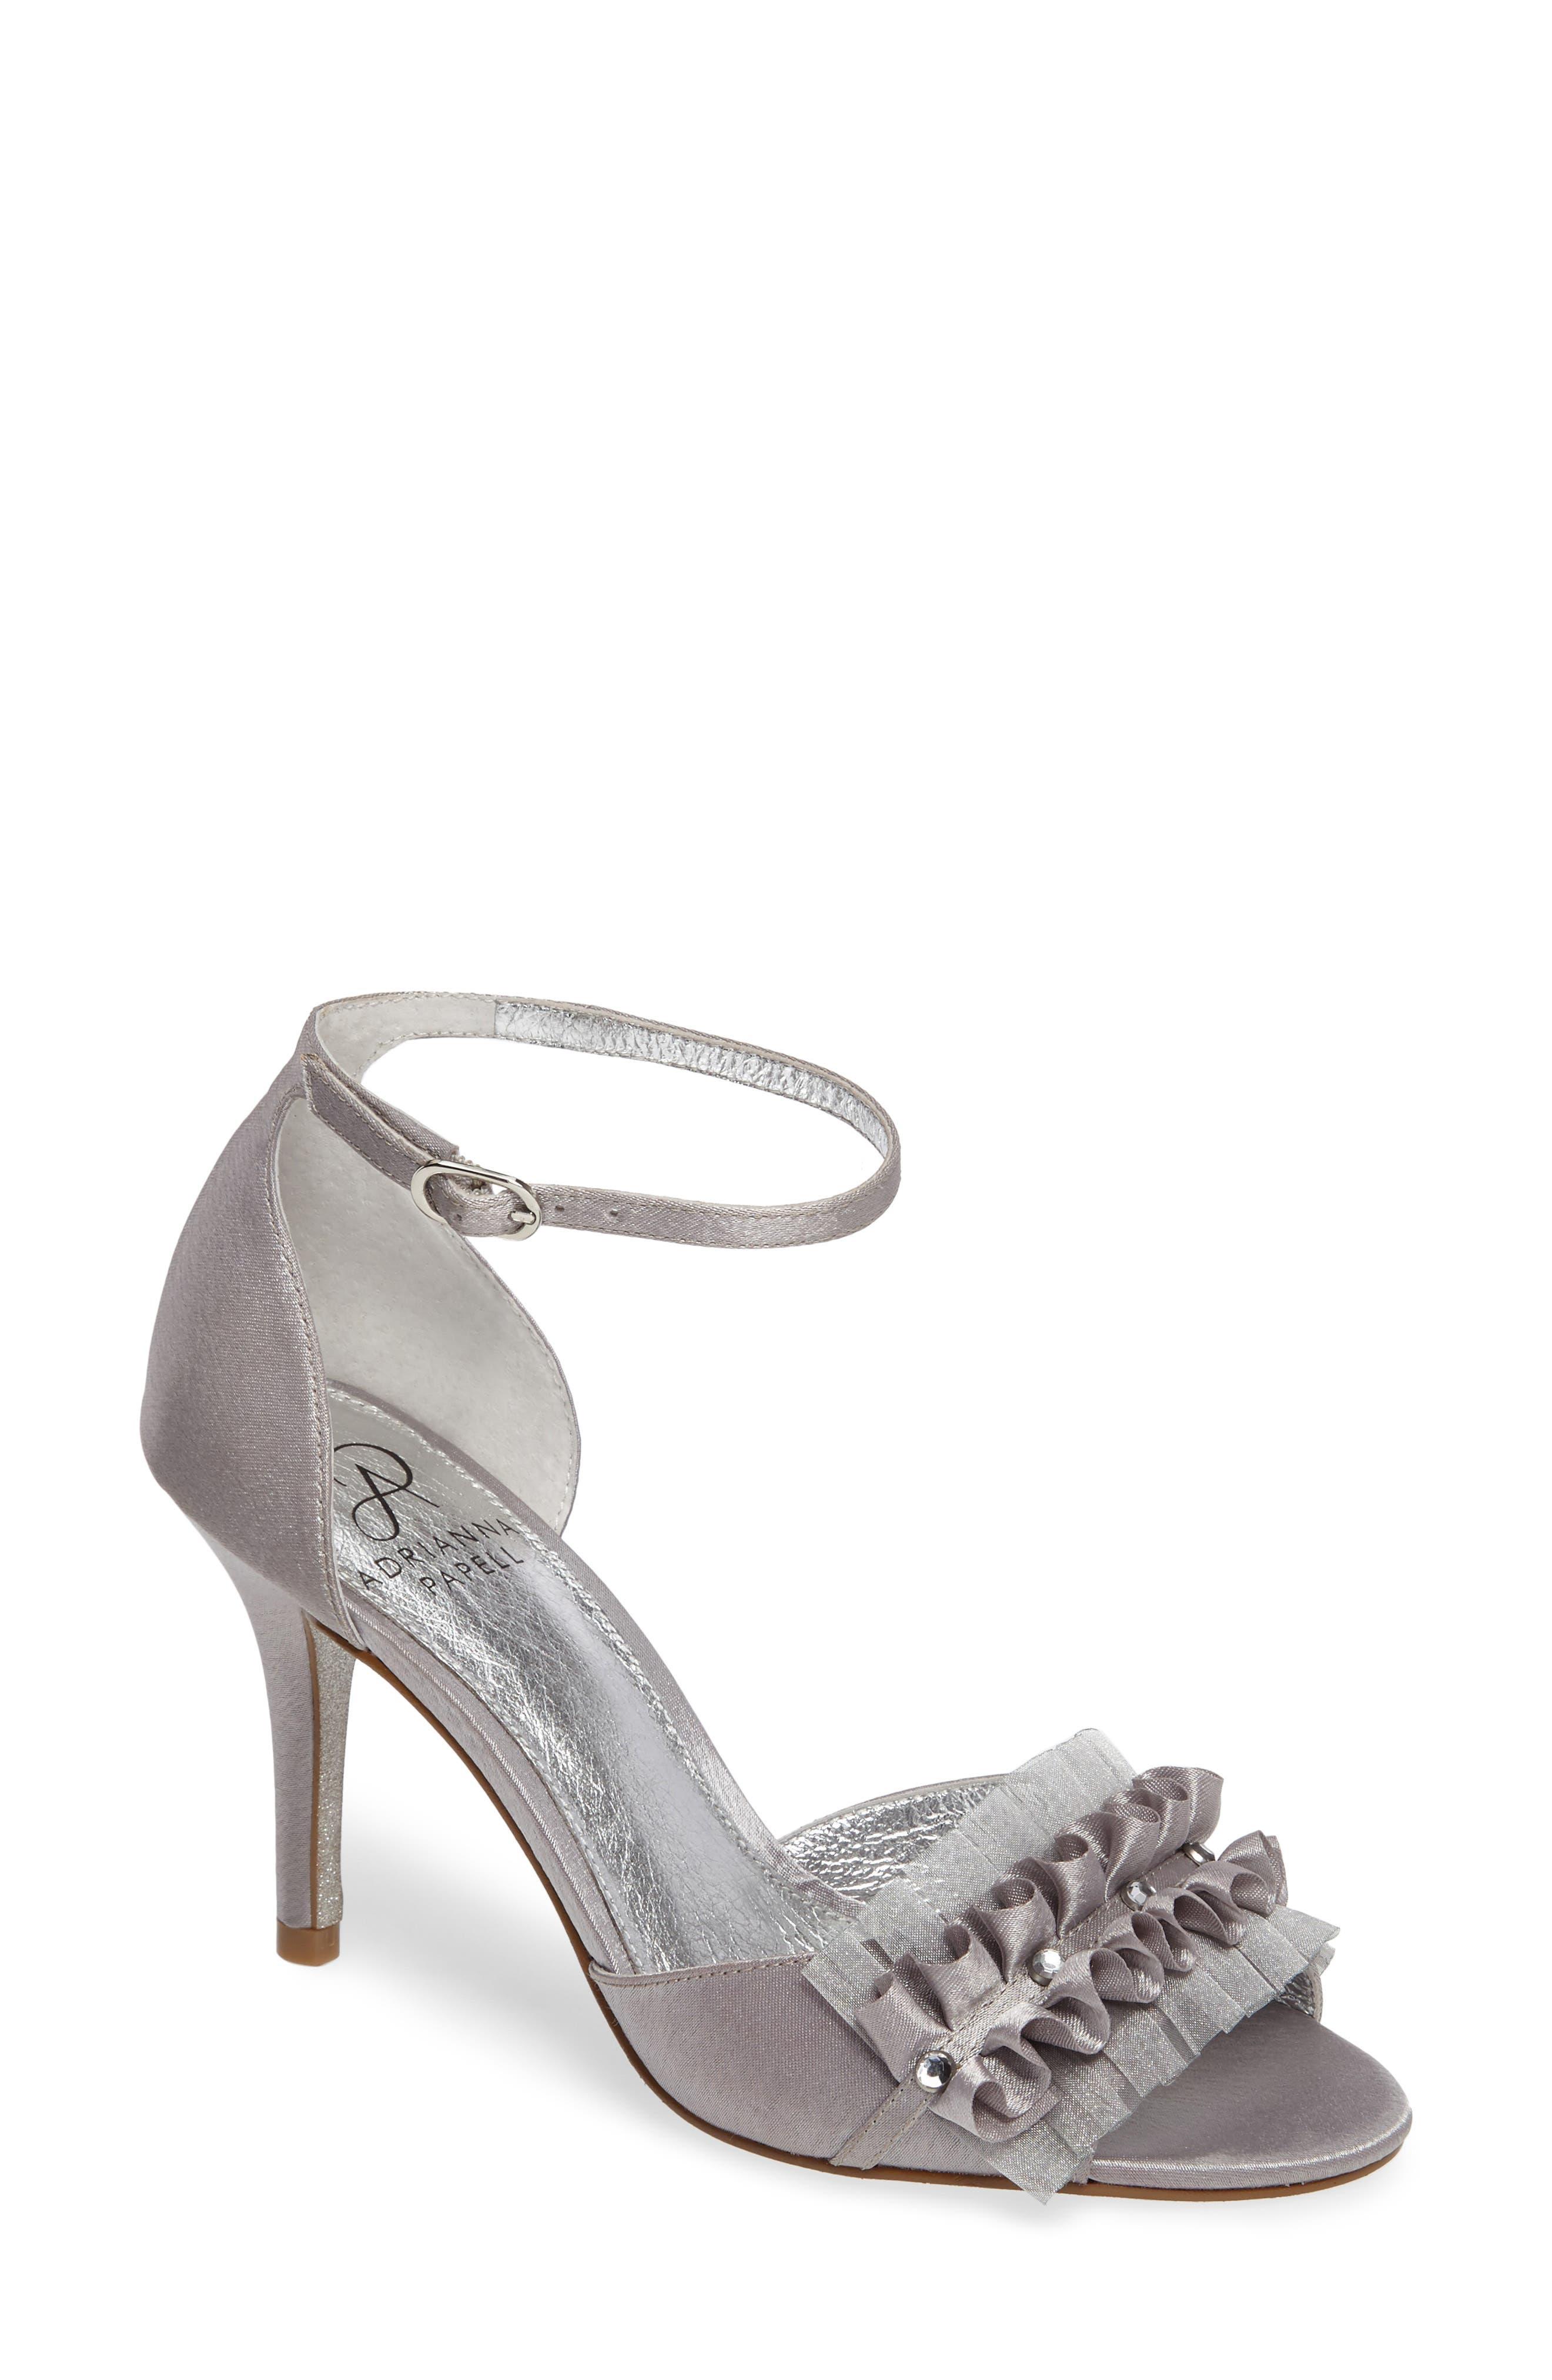 Alternate Image 1 Selected - Adrianna Papell Alcott Chiffon Ruffle Sandal (Women)